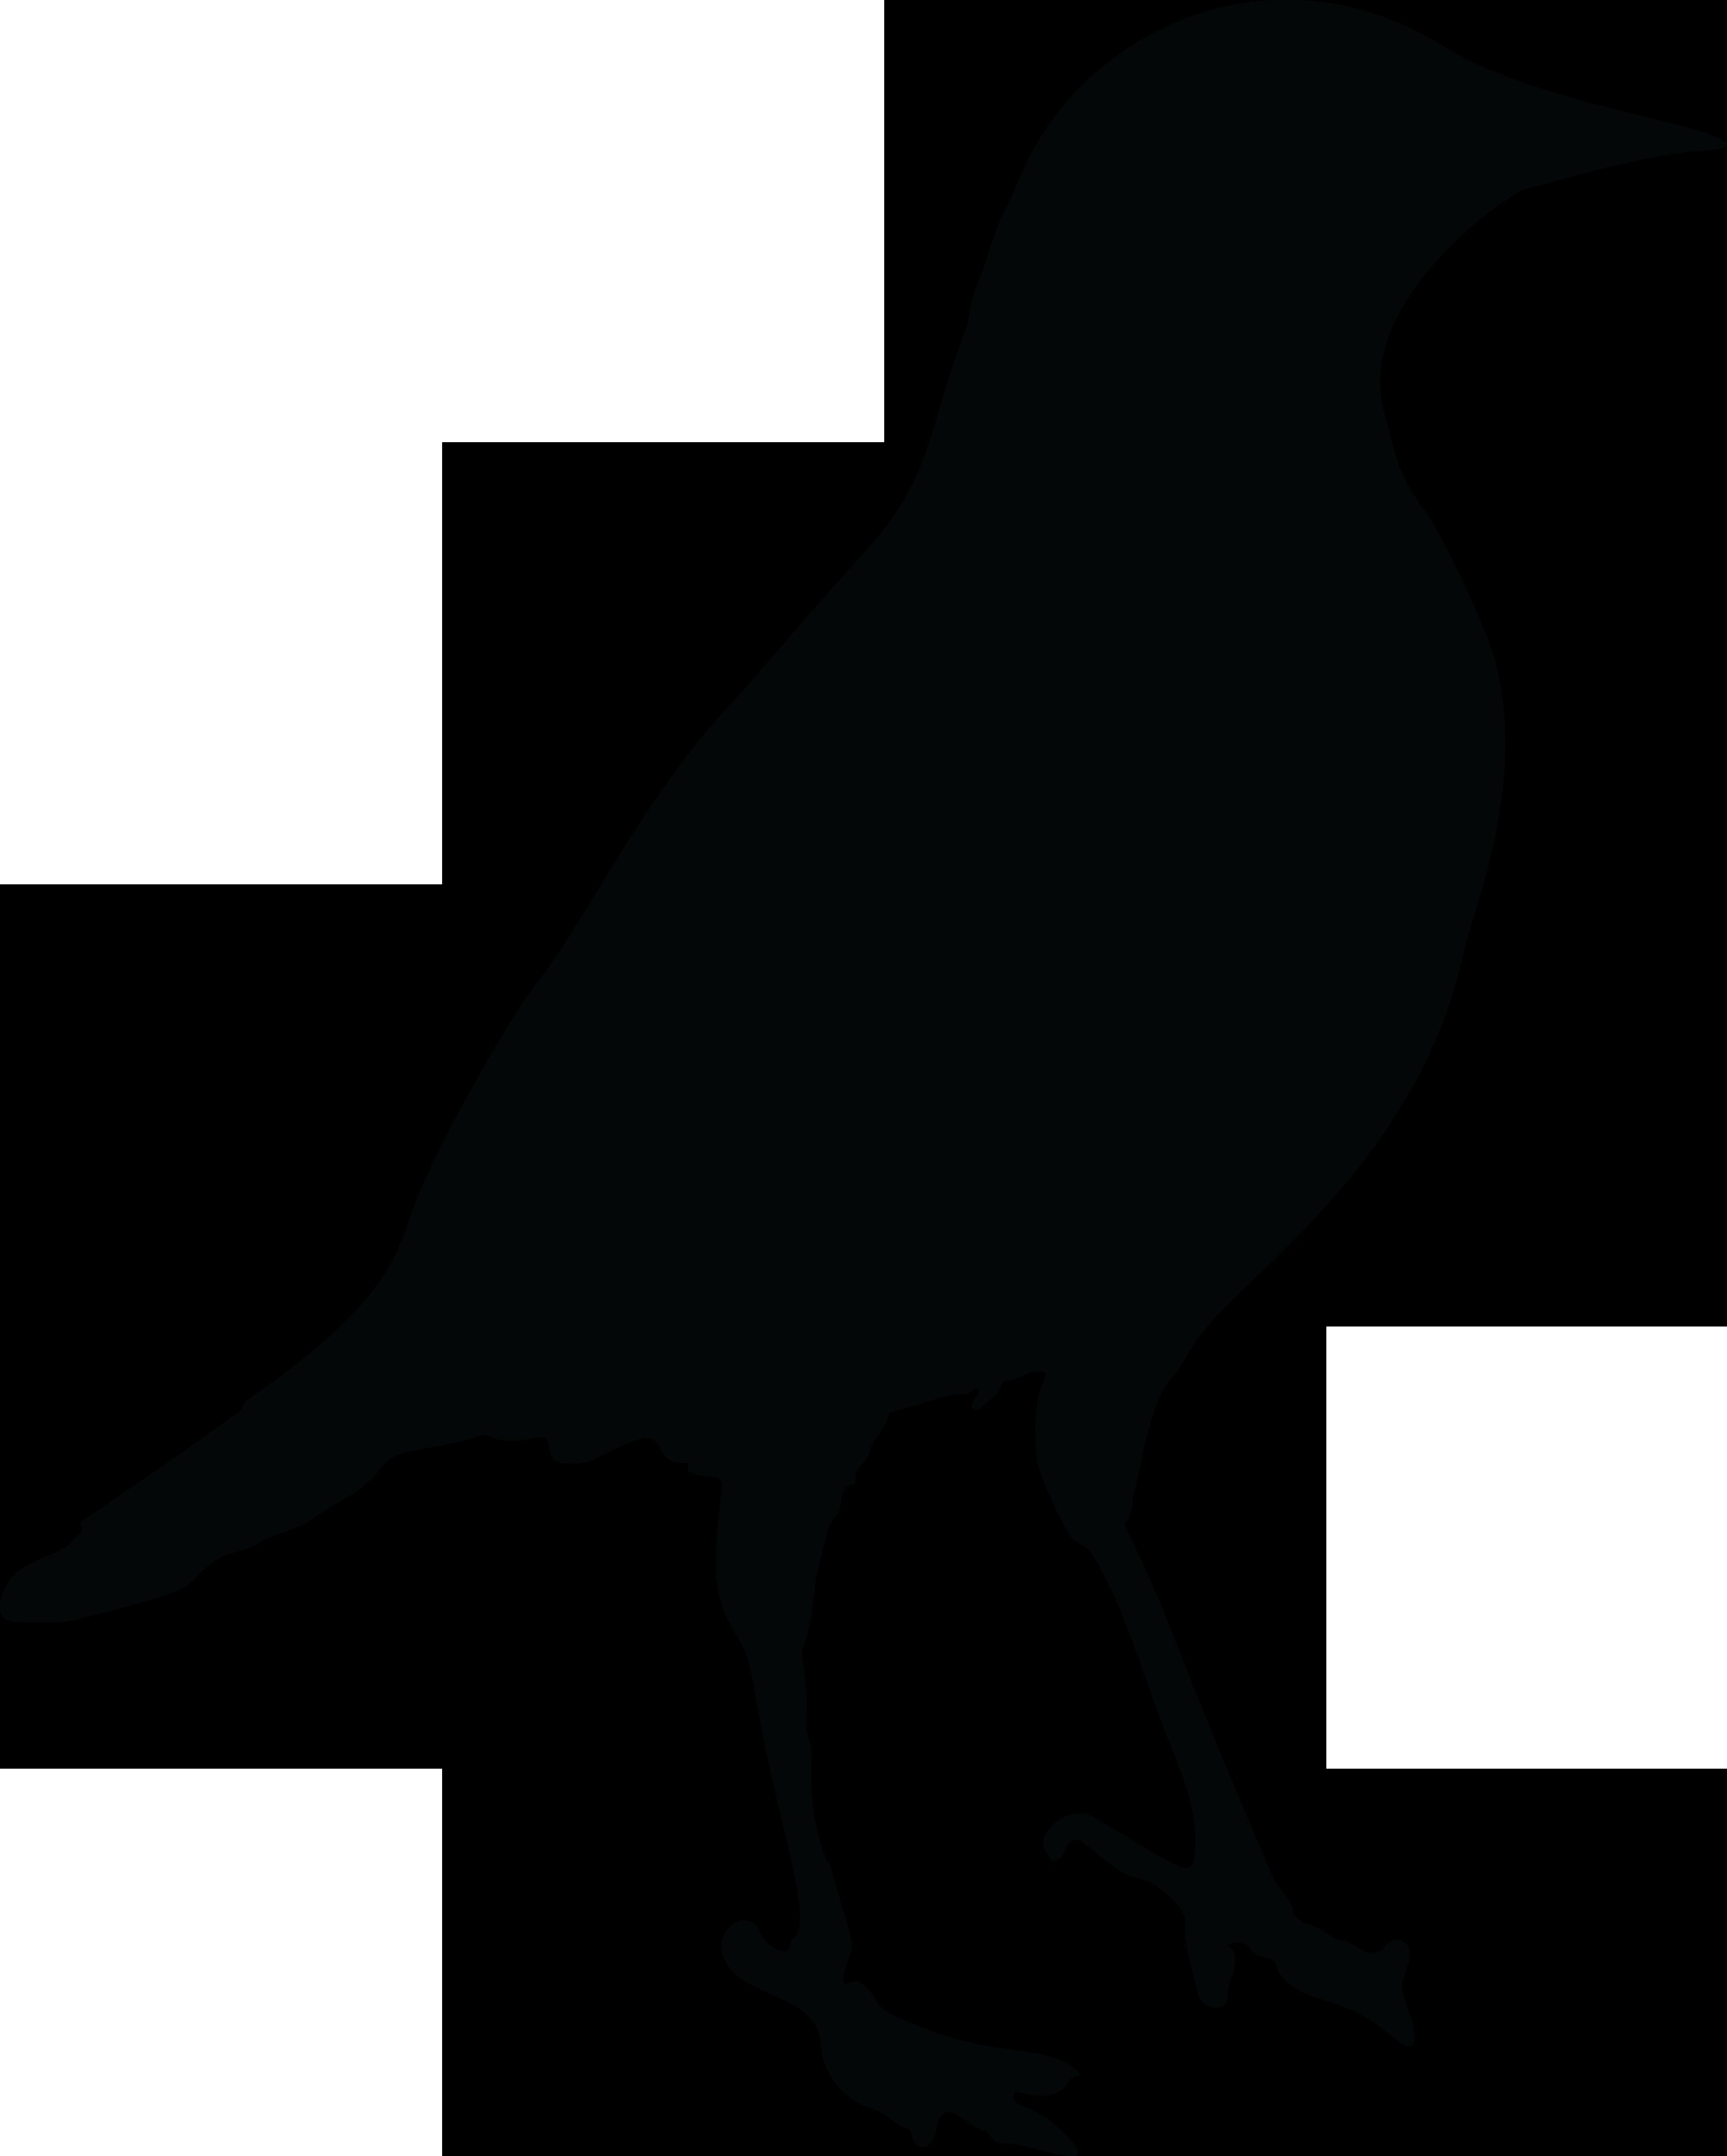 clip art royalty free stock Blackbird drawing wildlife. Common clip art bird